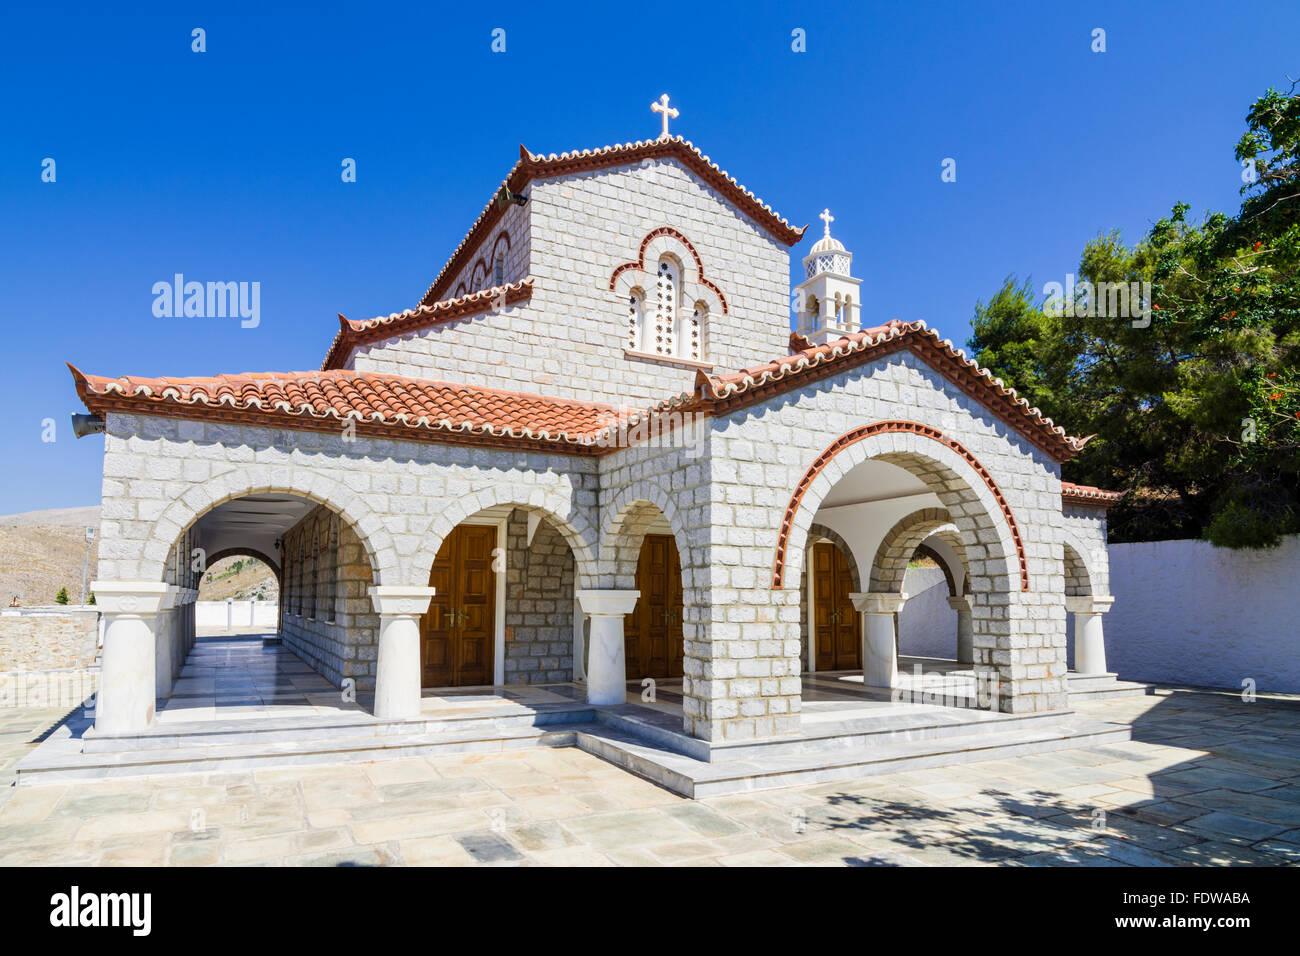 Church of Saint Konstantinos of Hydra, Hydra Island, Greece - Stock Image